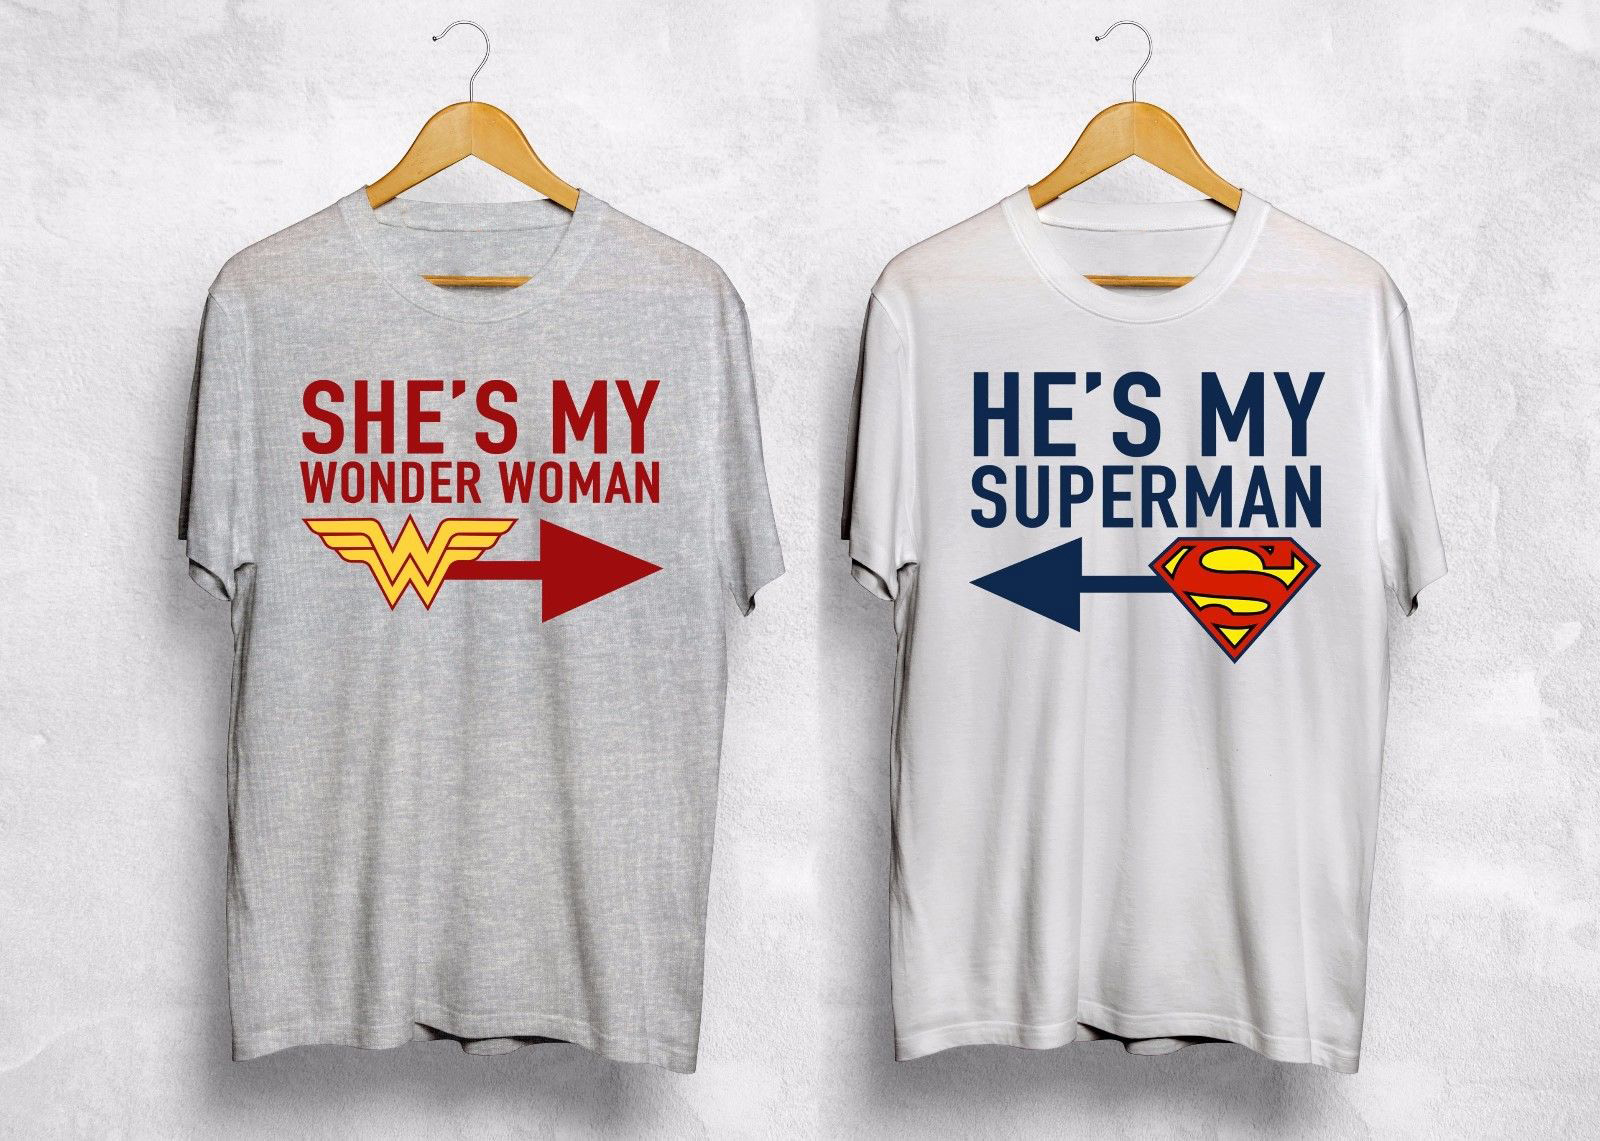 Он мой Супермен Shes мой Wonder Woman футболка пару Валентина подарок Wifey муженек хлопок короткий рукав Футболка мужская Повседневное Топ футболка